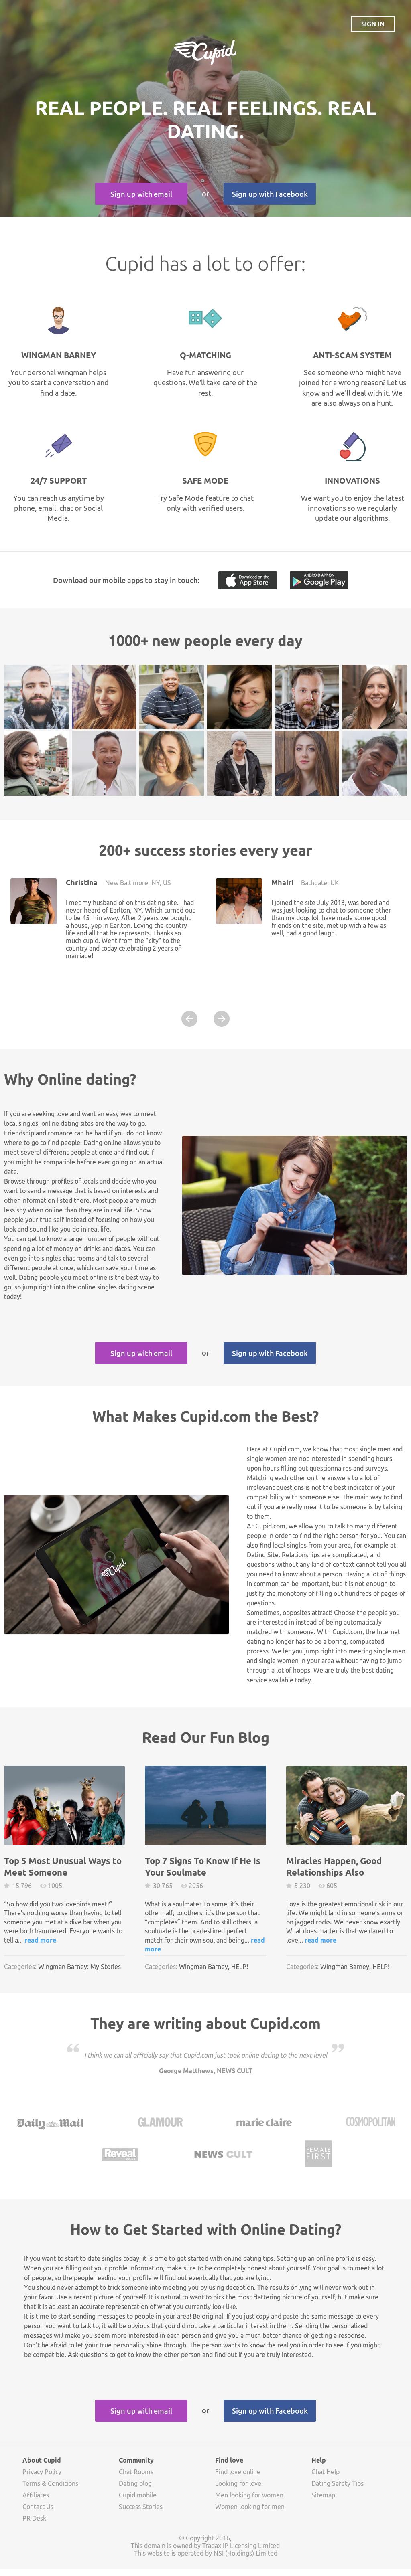 cupid website